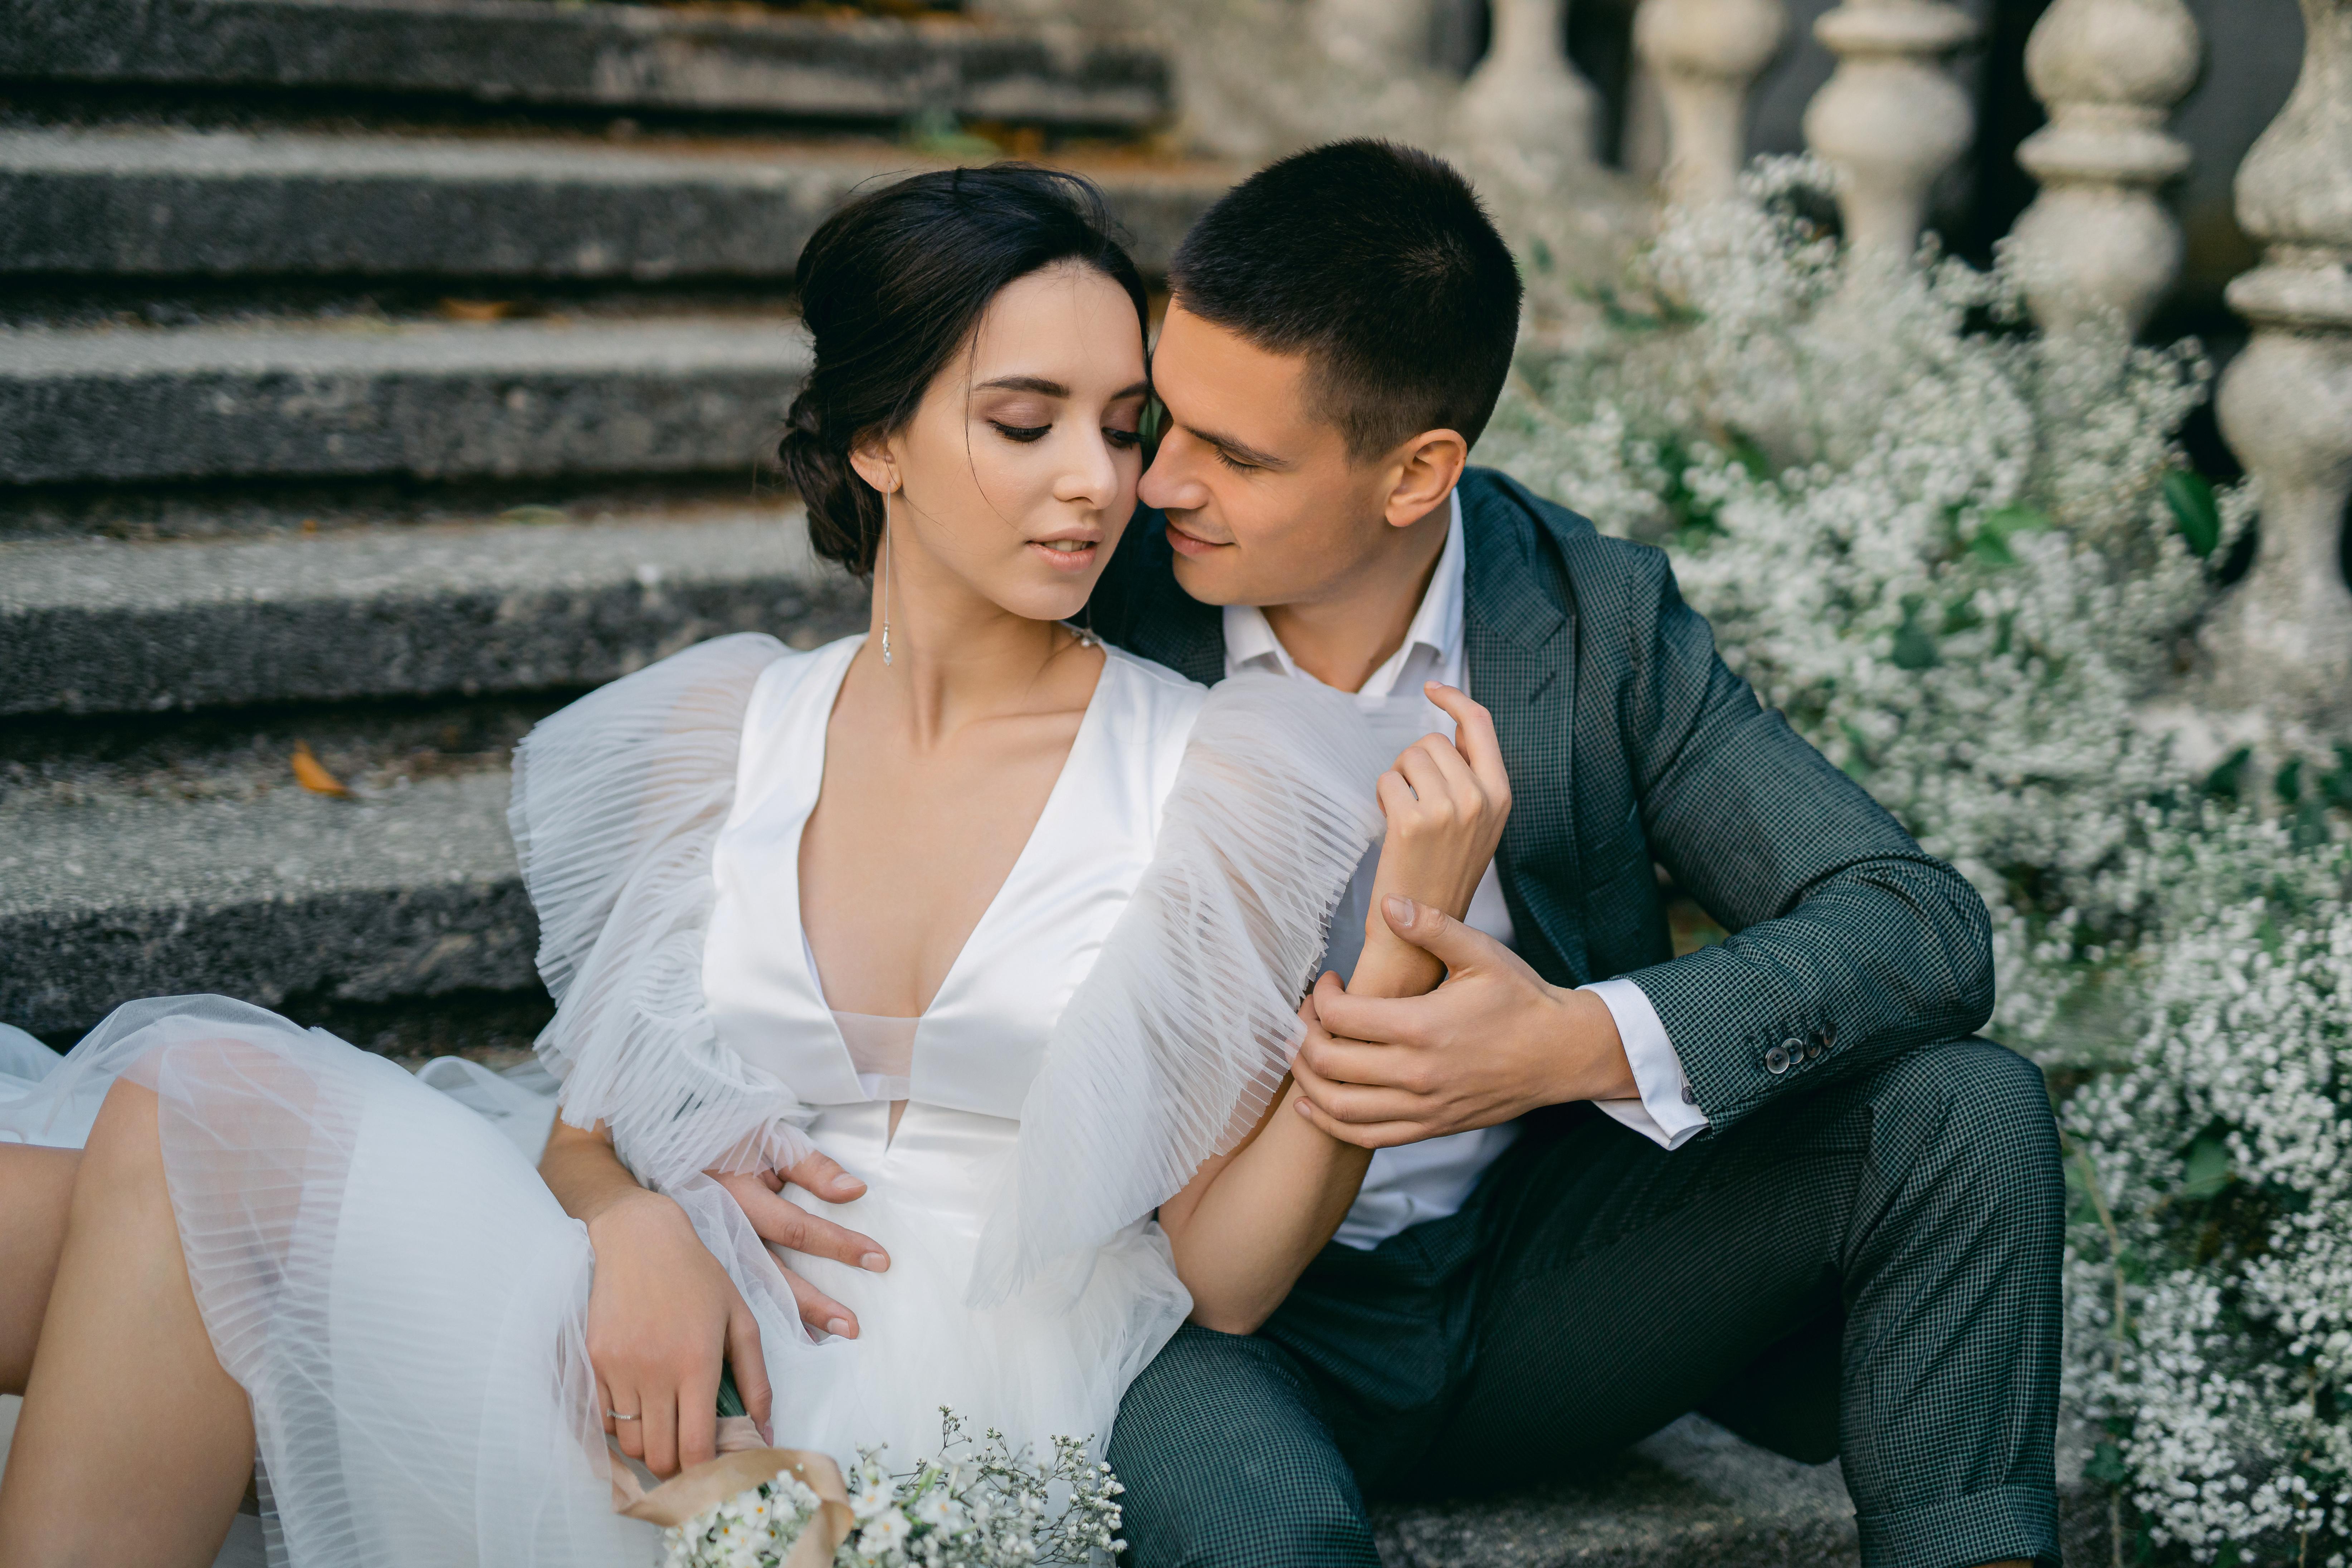 How to Plan An Unforgettable Elopement Wedding